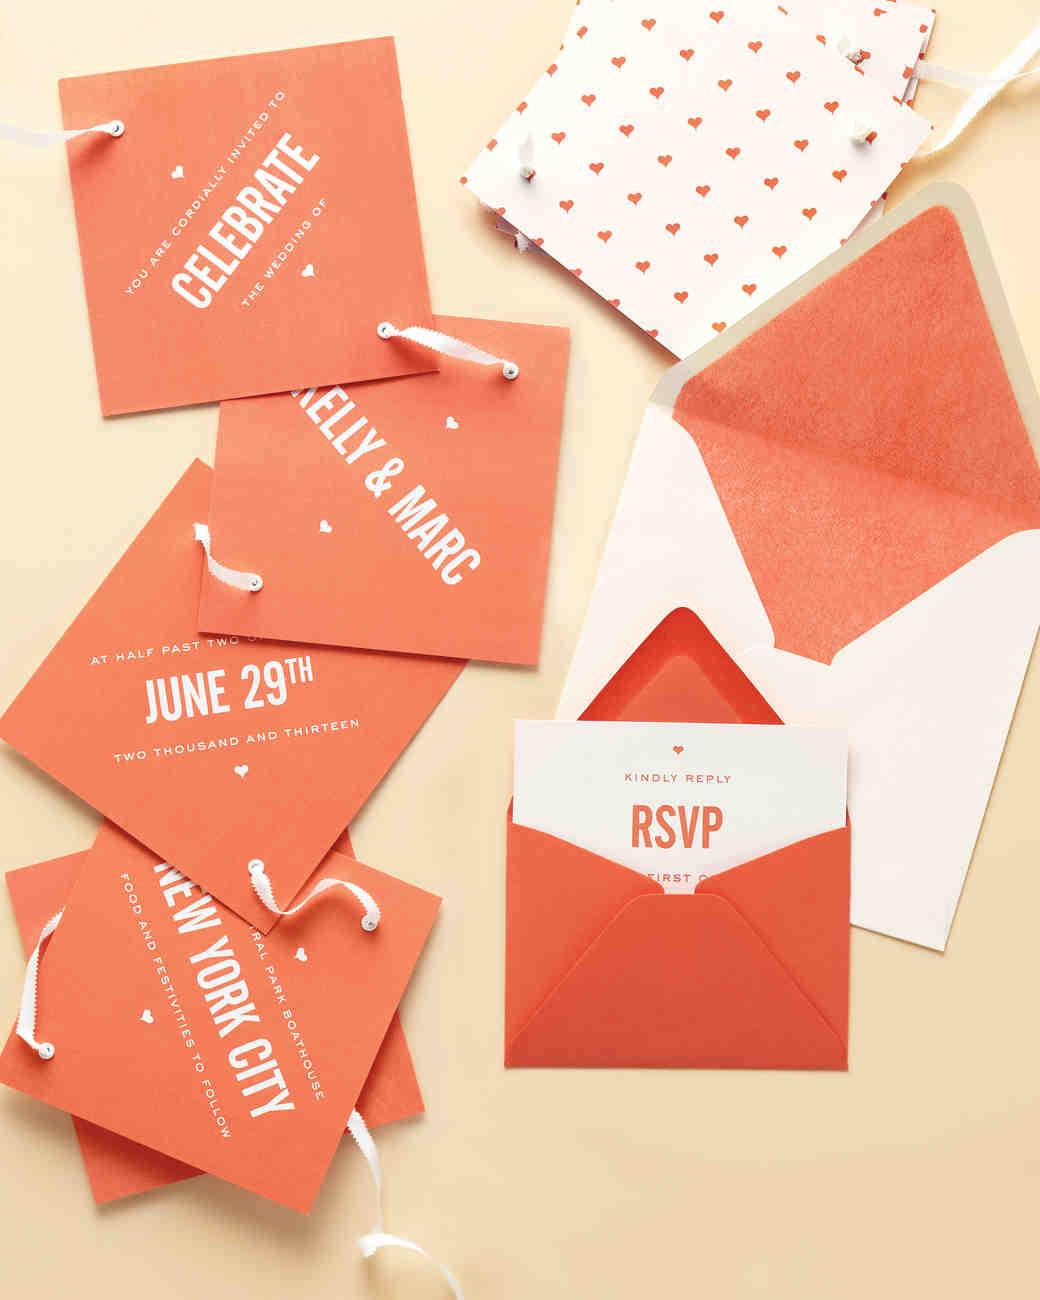 unique wedding invitations martha stewart weddings - Unique Wedding Invites